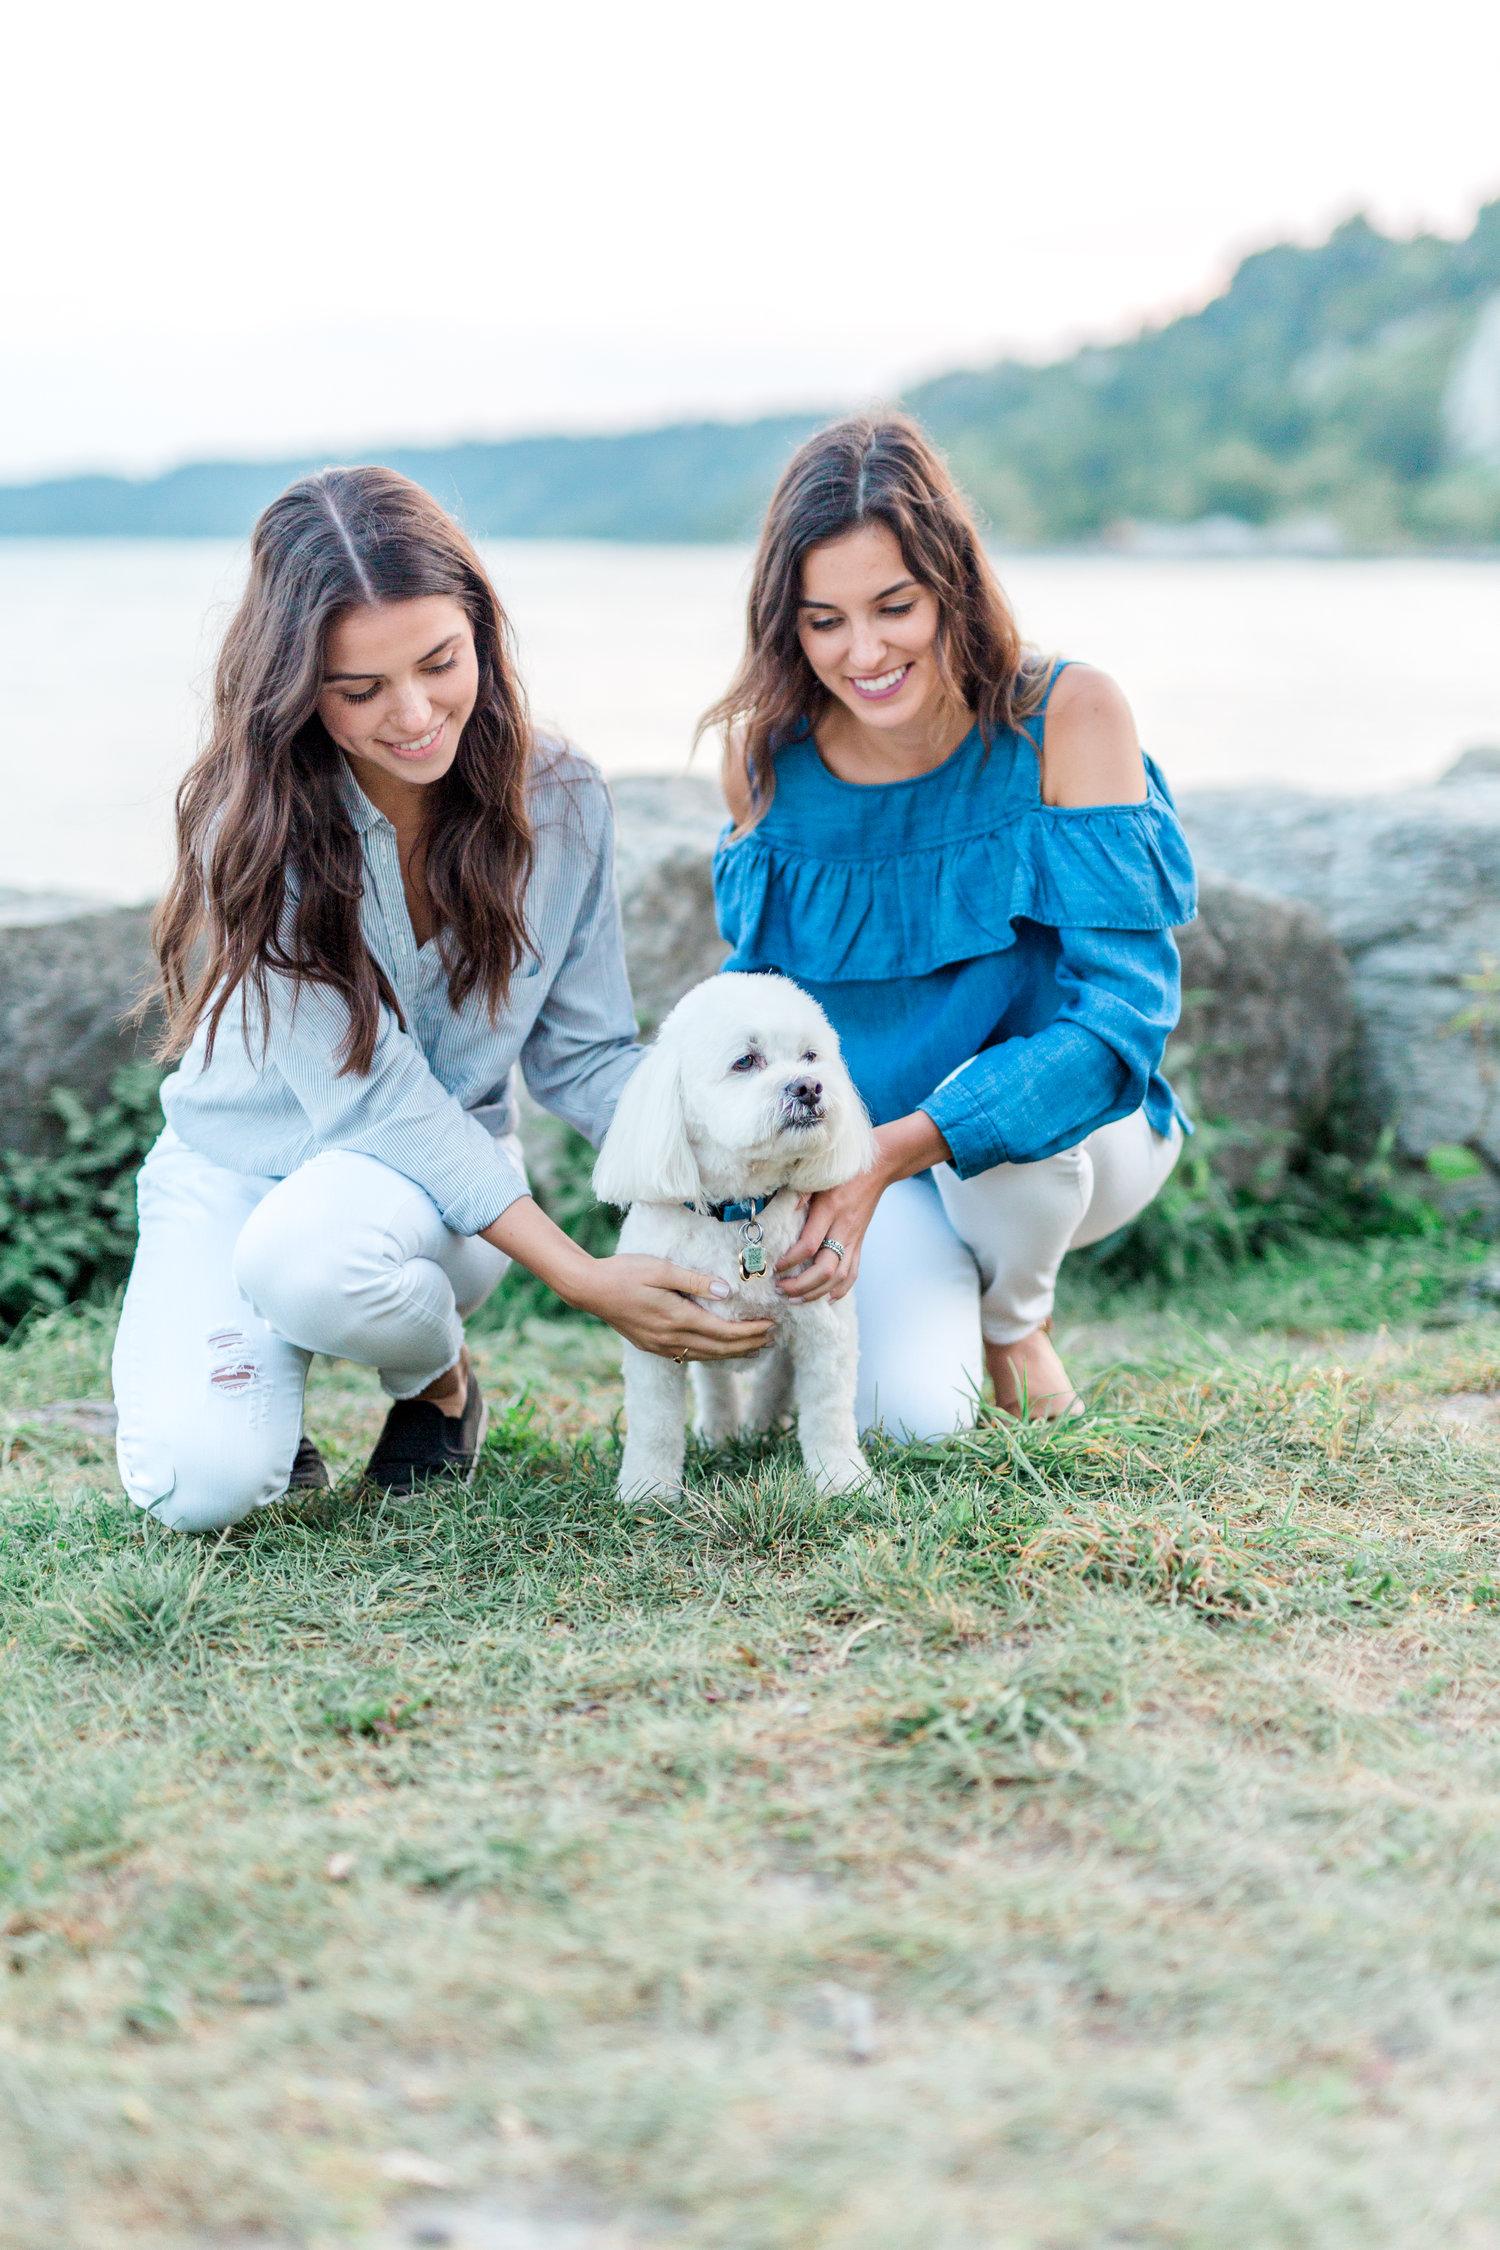 Danielle-Giroux-Amir-Golbazi-Genua-Family-Photography-Scarborough-Bluffs-9929.jpg